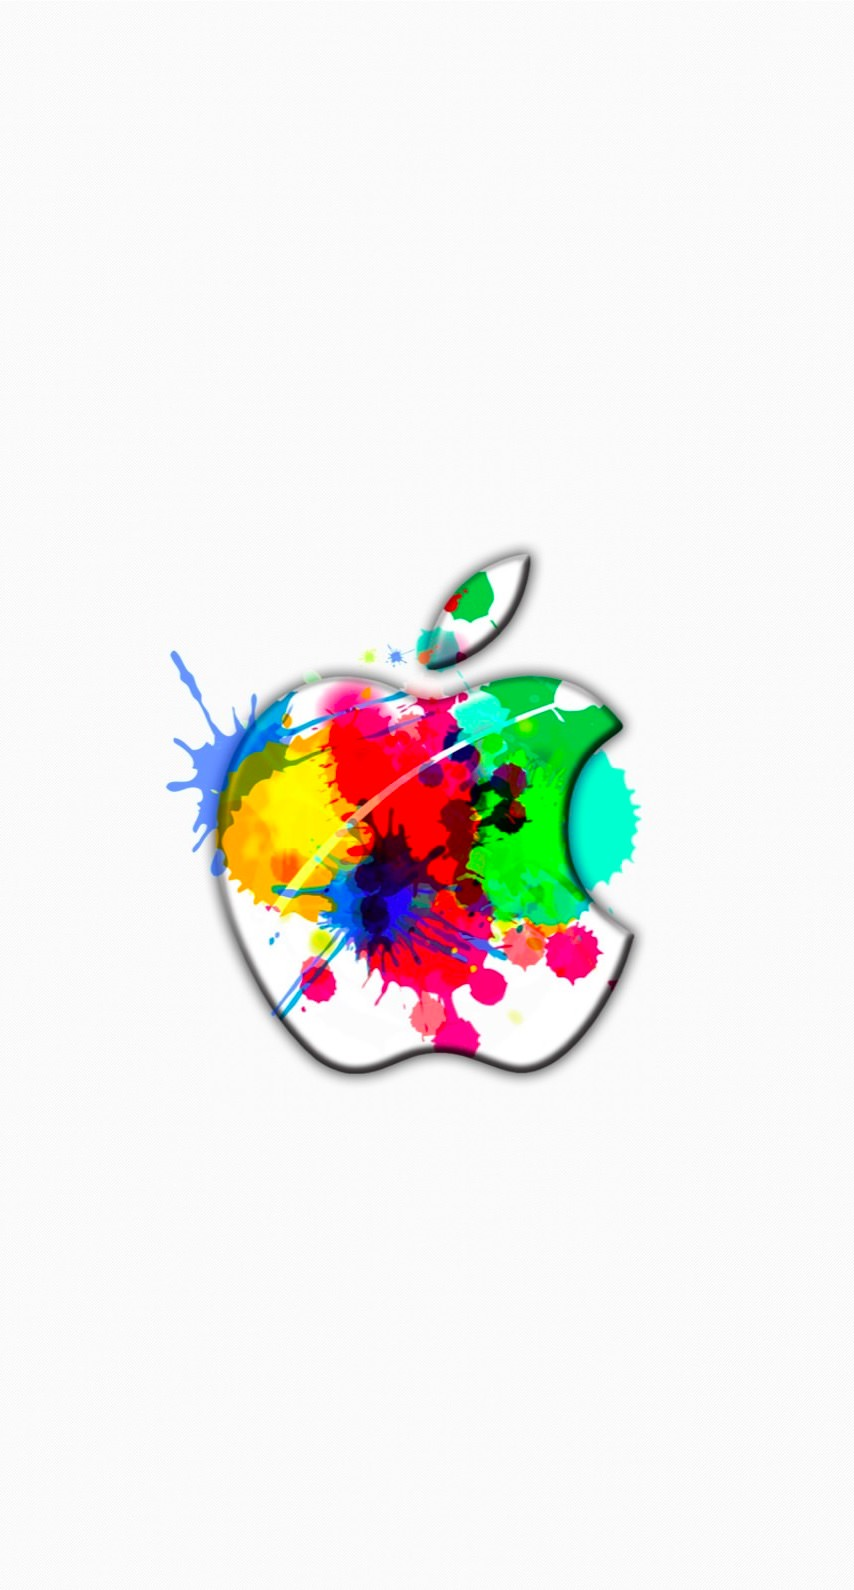 Appleペンキ Wallpaper Sc Iphone7壁紙